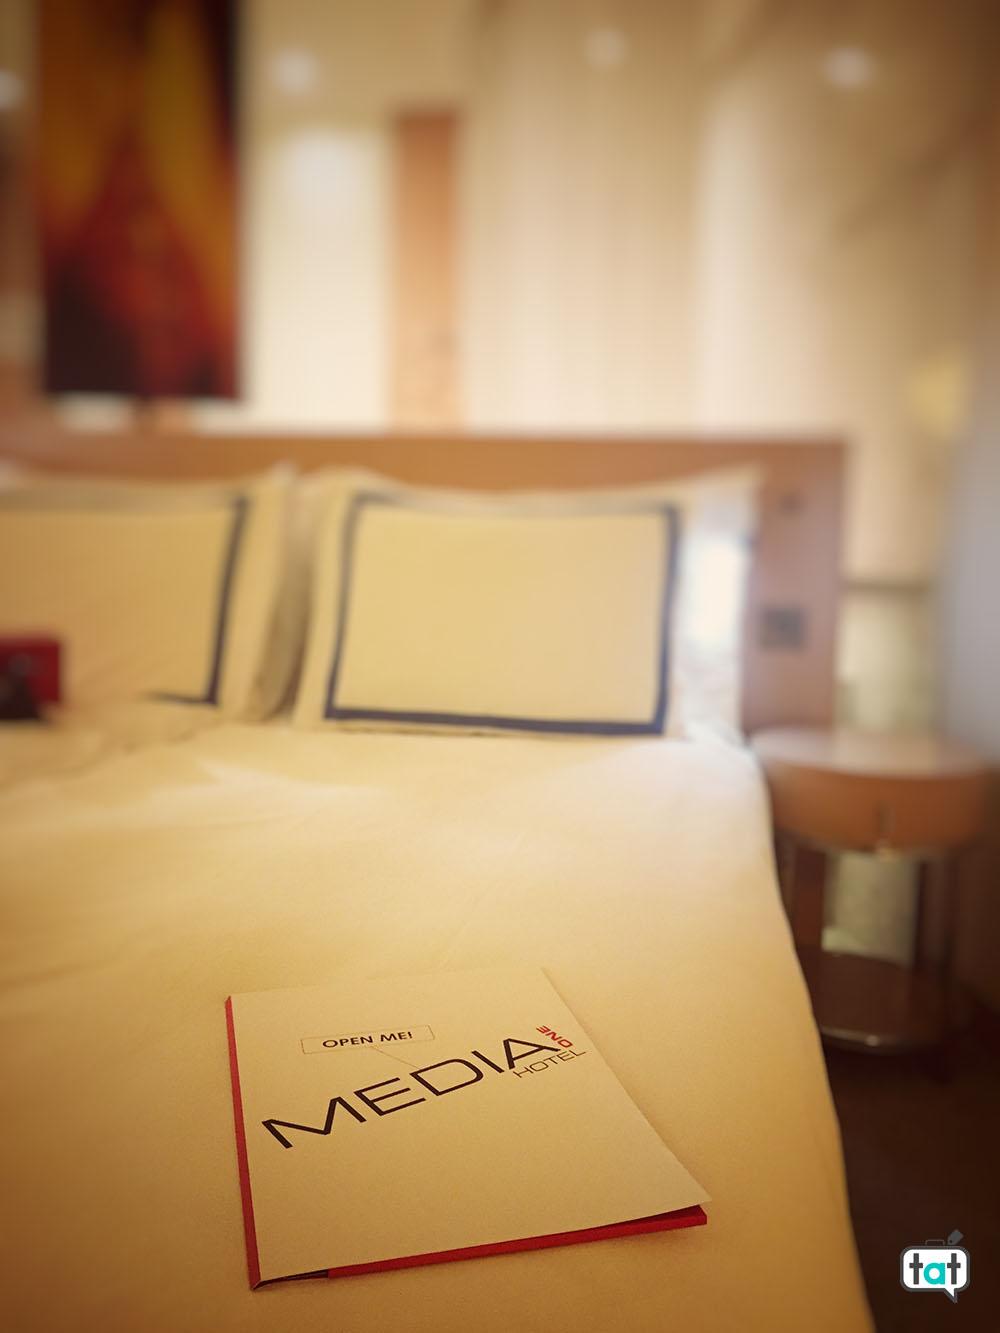 Dubai Media one hotel camera